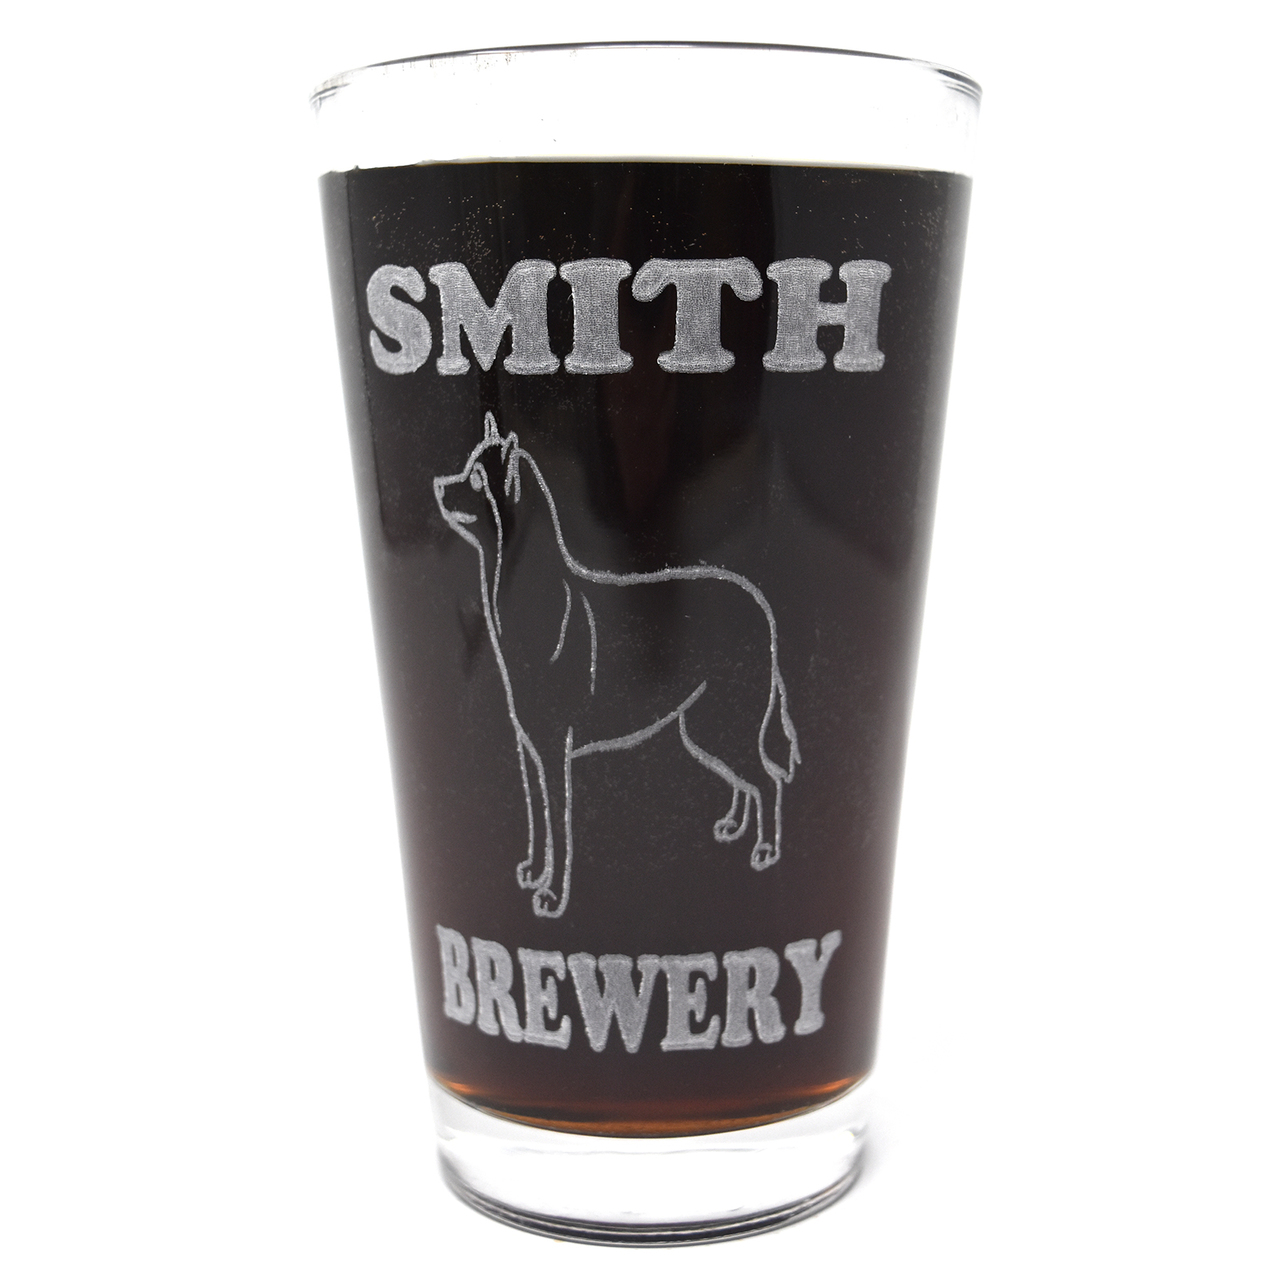 Hot Dog Personalized Pint Glass Beer Mug - Siberian Huskie